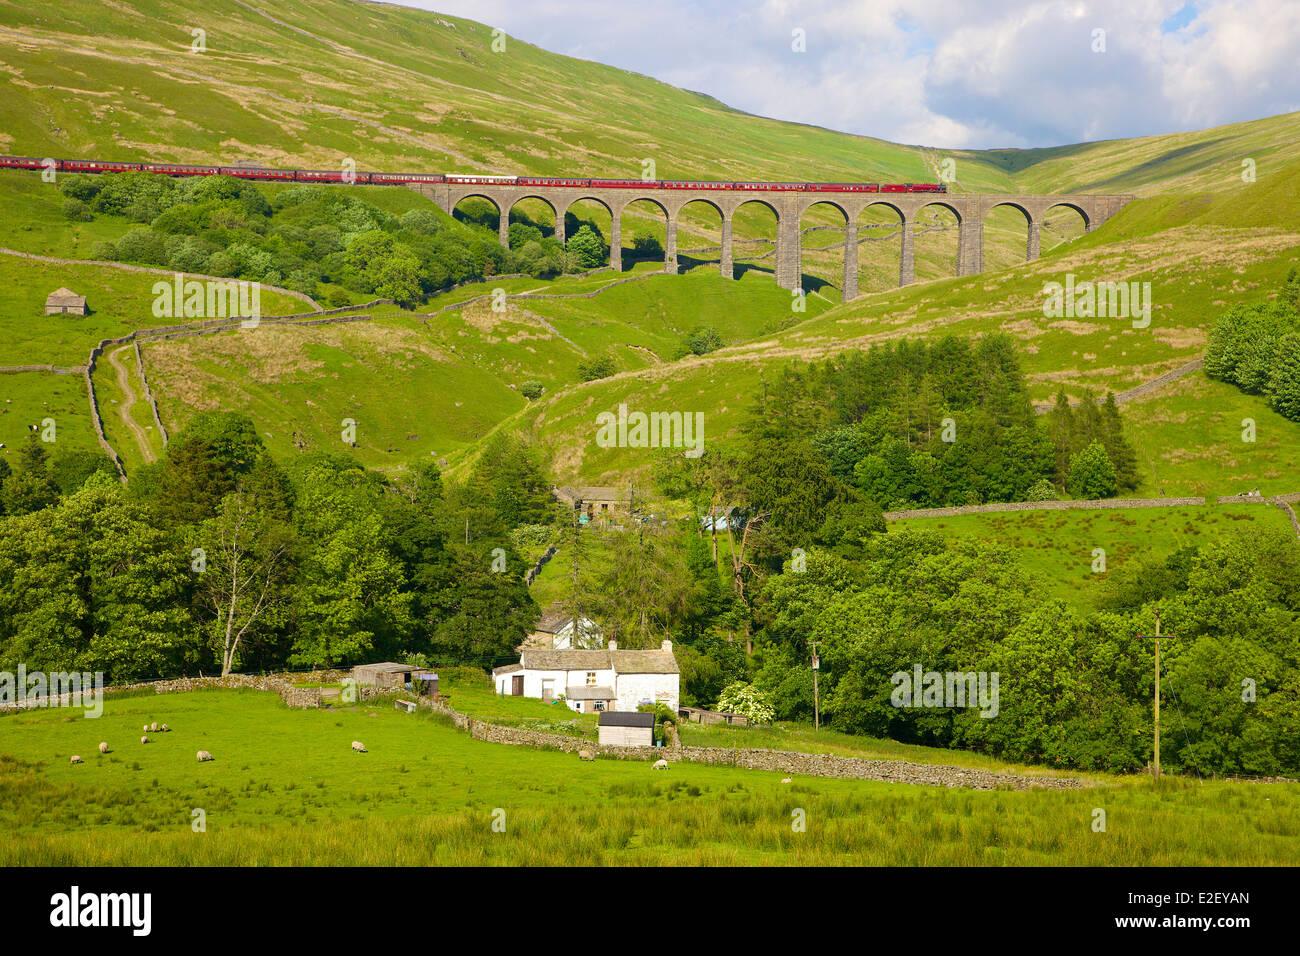 LMS Jubilee Class 45699 Galatea 'Fellsman', steam train on Arten Gill Viaduct. Settle to Carlisle Railway - Stock Image